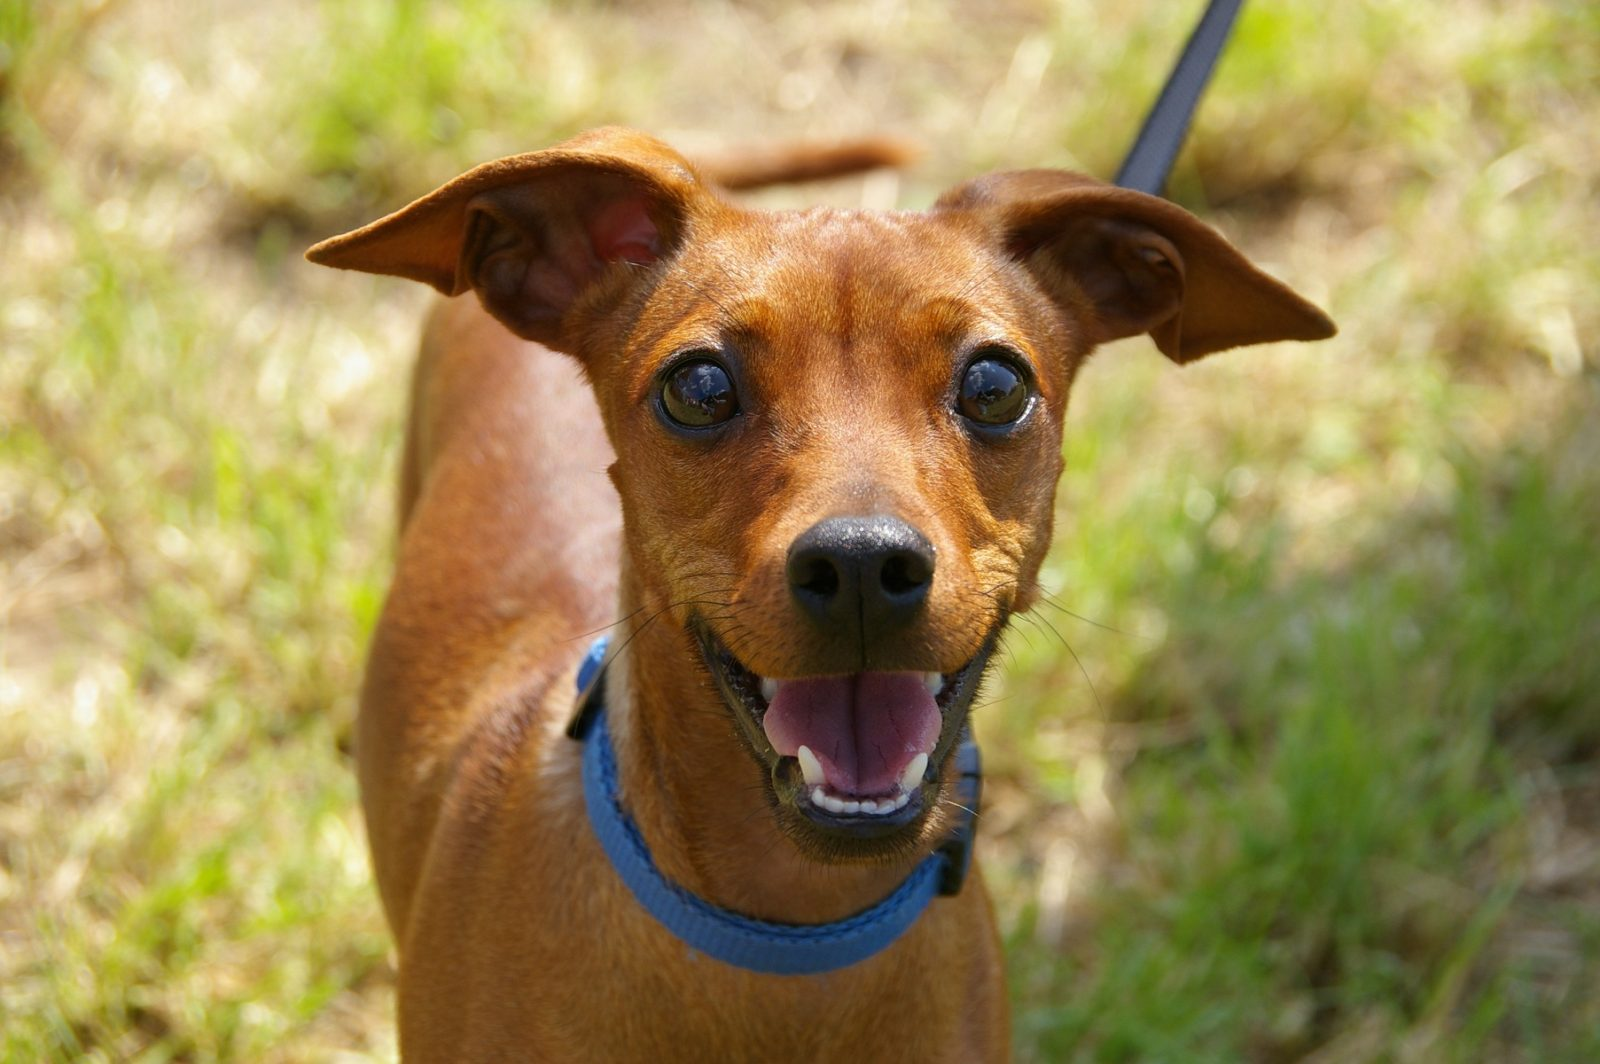 animal-portrait-dog-curious-awakened-60913